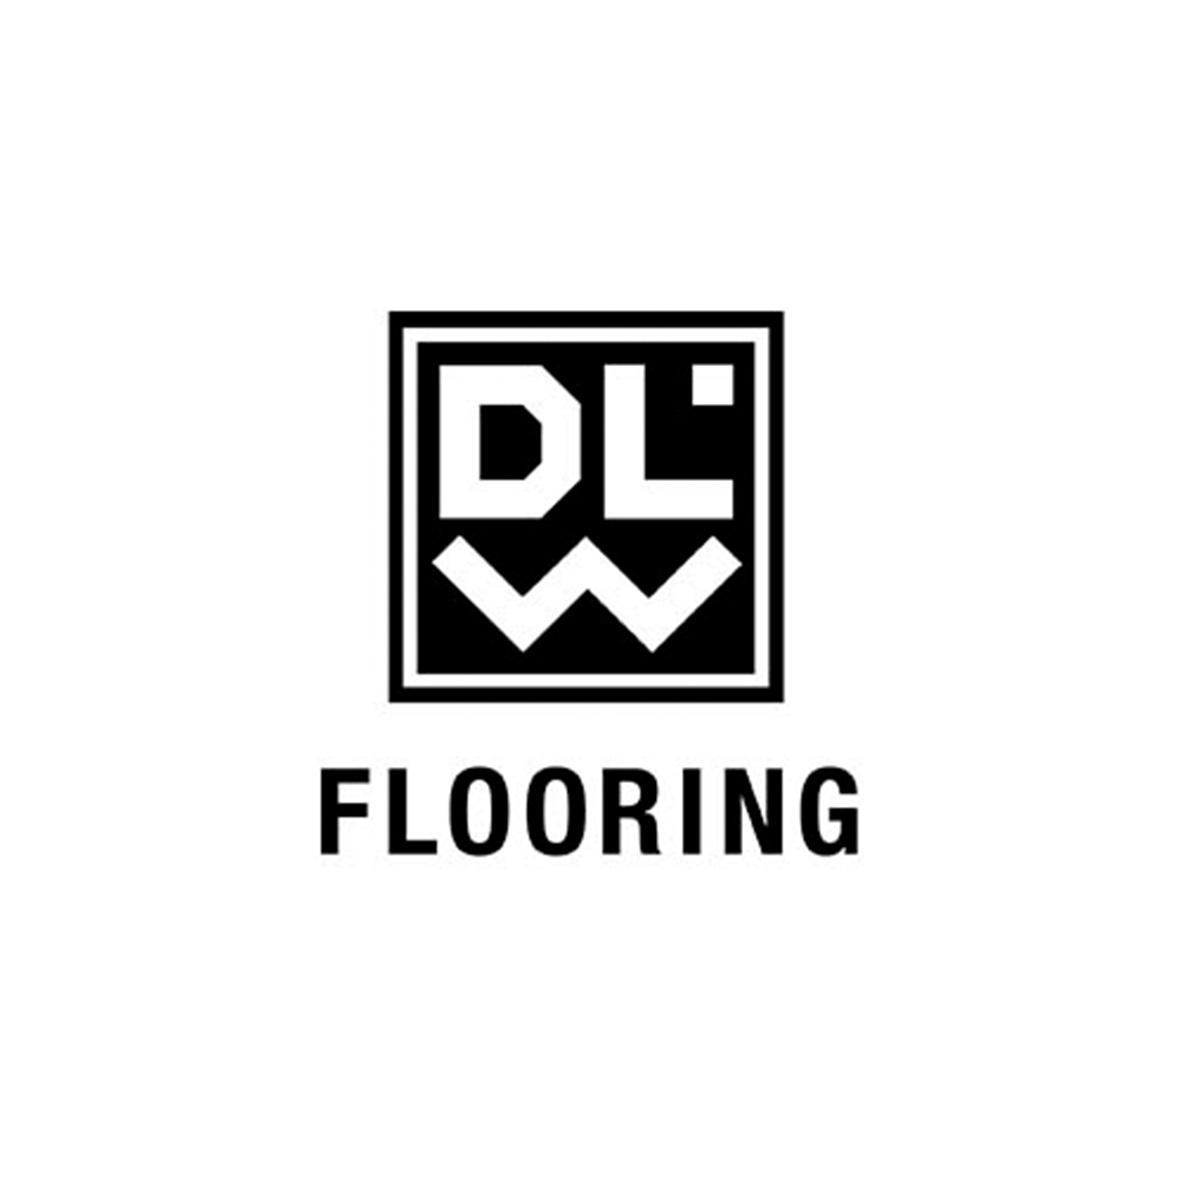 DLW Flooring  Nadelvlies  Bodenbeläge einfach online